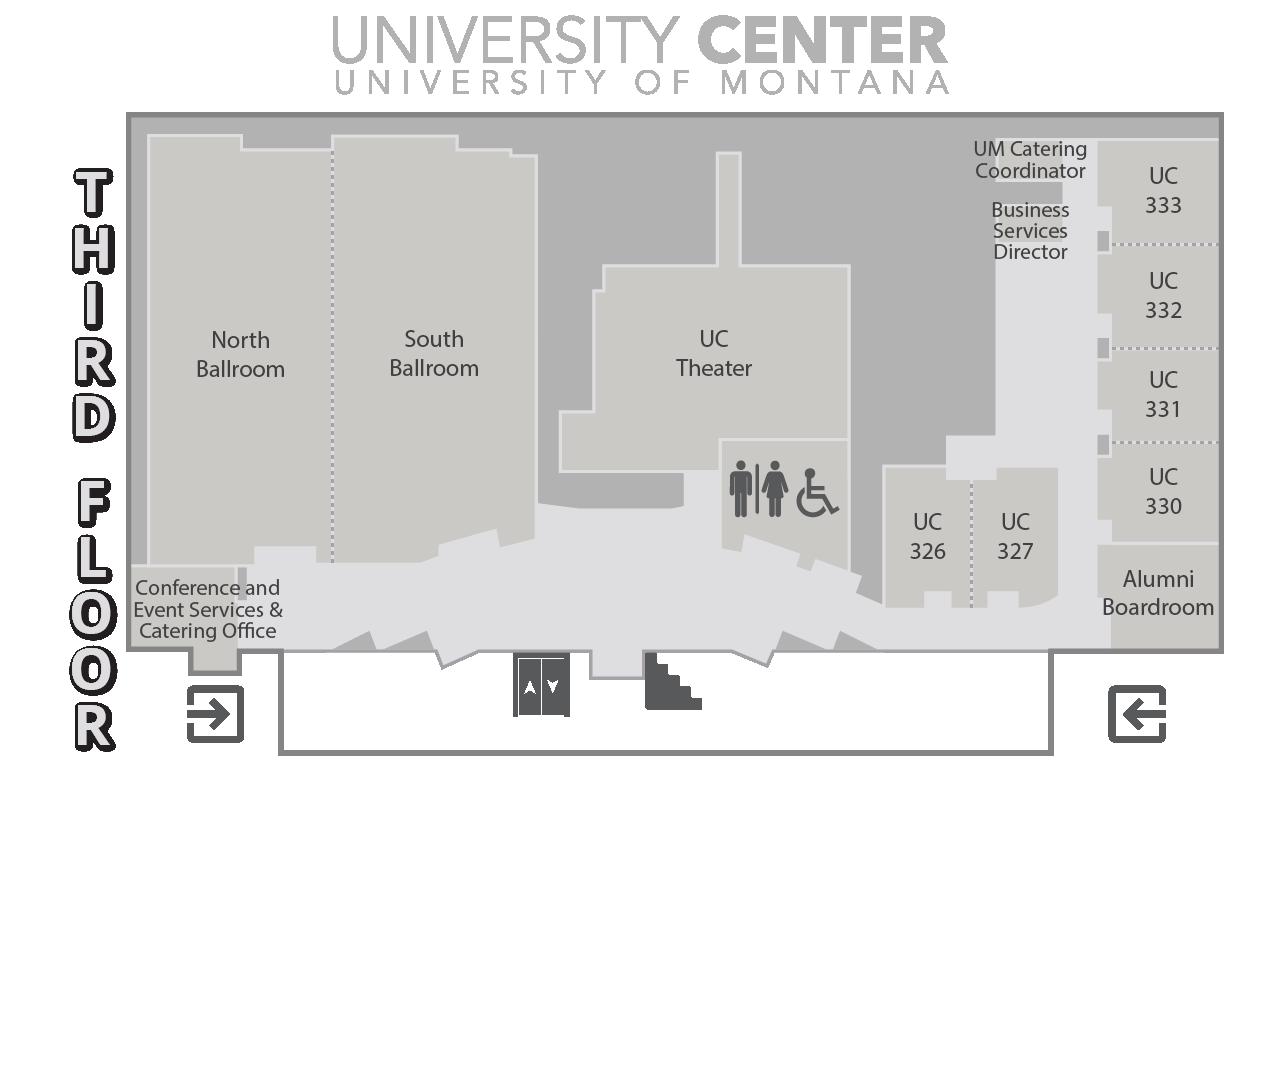 floor3 Uc Main Campus Map on university of california berkeley campus map, uc university map, uc hospital map, uc campuses map, uc medical campus map, uc library map, cincinnati campus map, toledo campus map, uc regional campus map, uc san diego map, uc clermont map, maine campus map, proctor hall uc campus map, uc system campus map, ucdavis campus map, uc off campus map, emery uc map, uc west map, uc northridge map, uc denver campus,